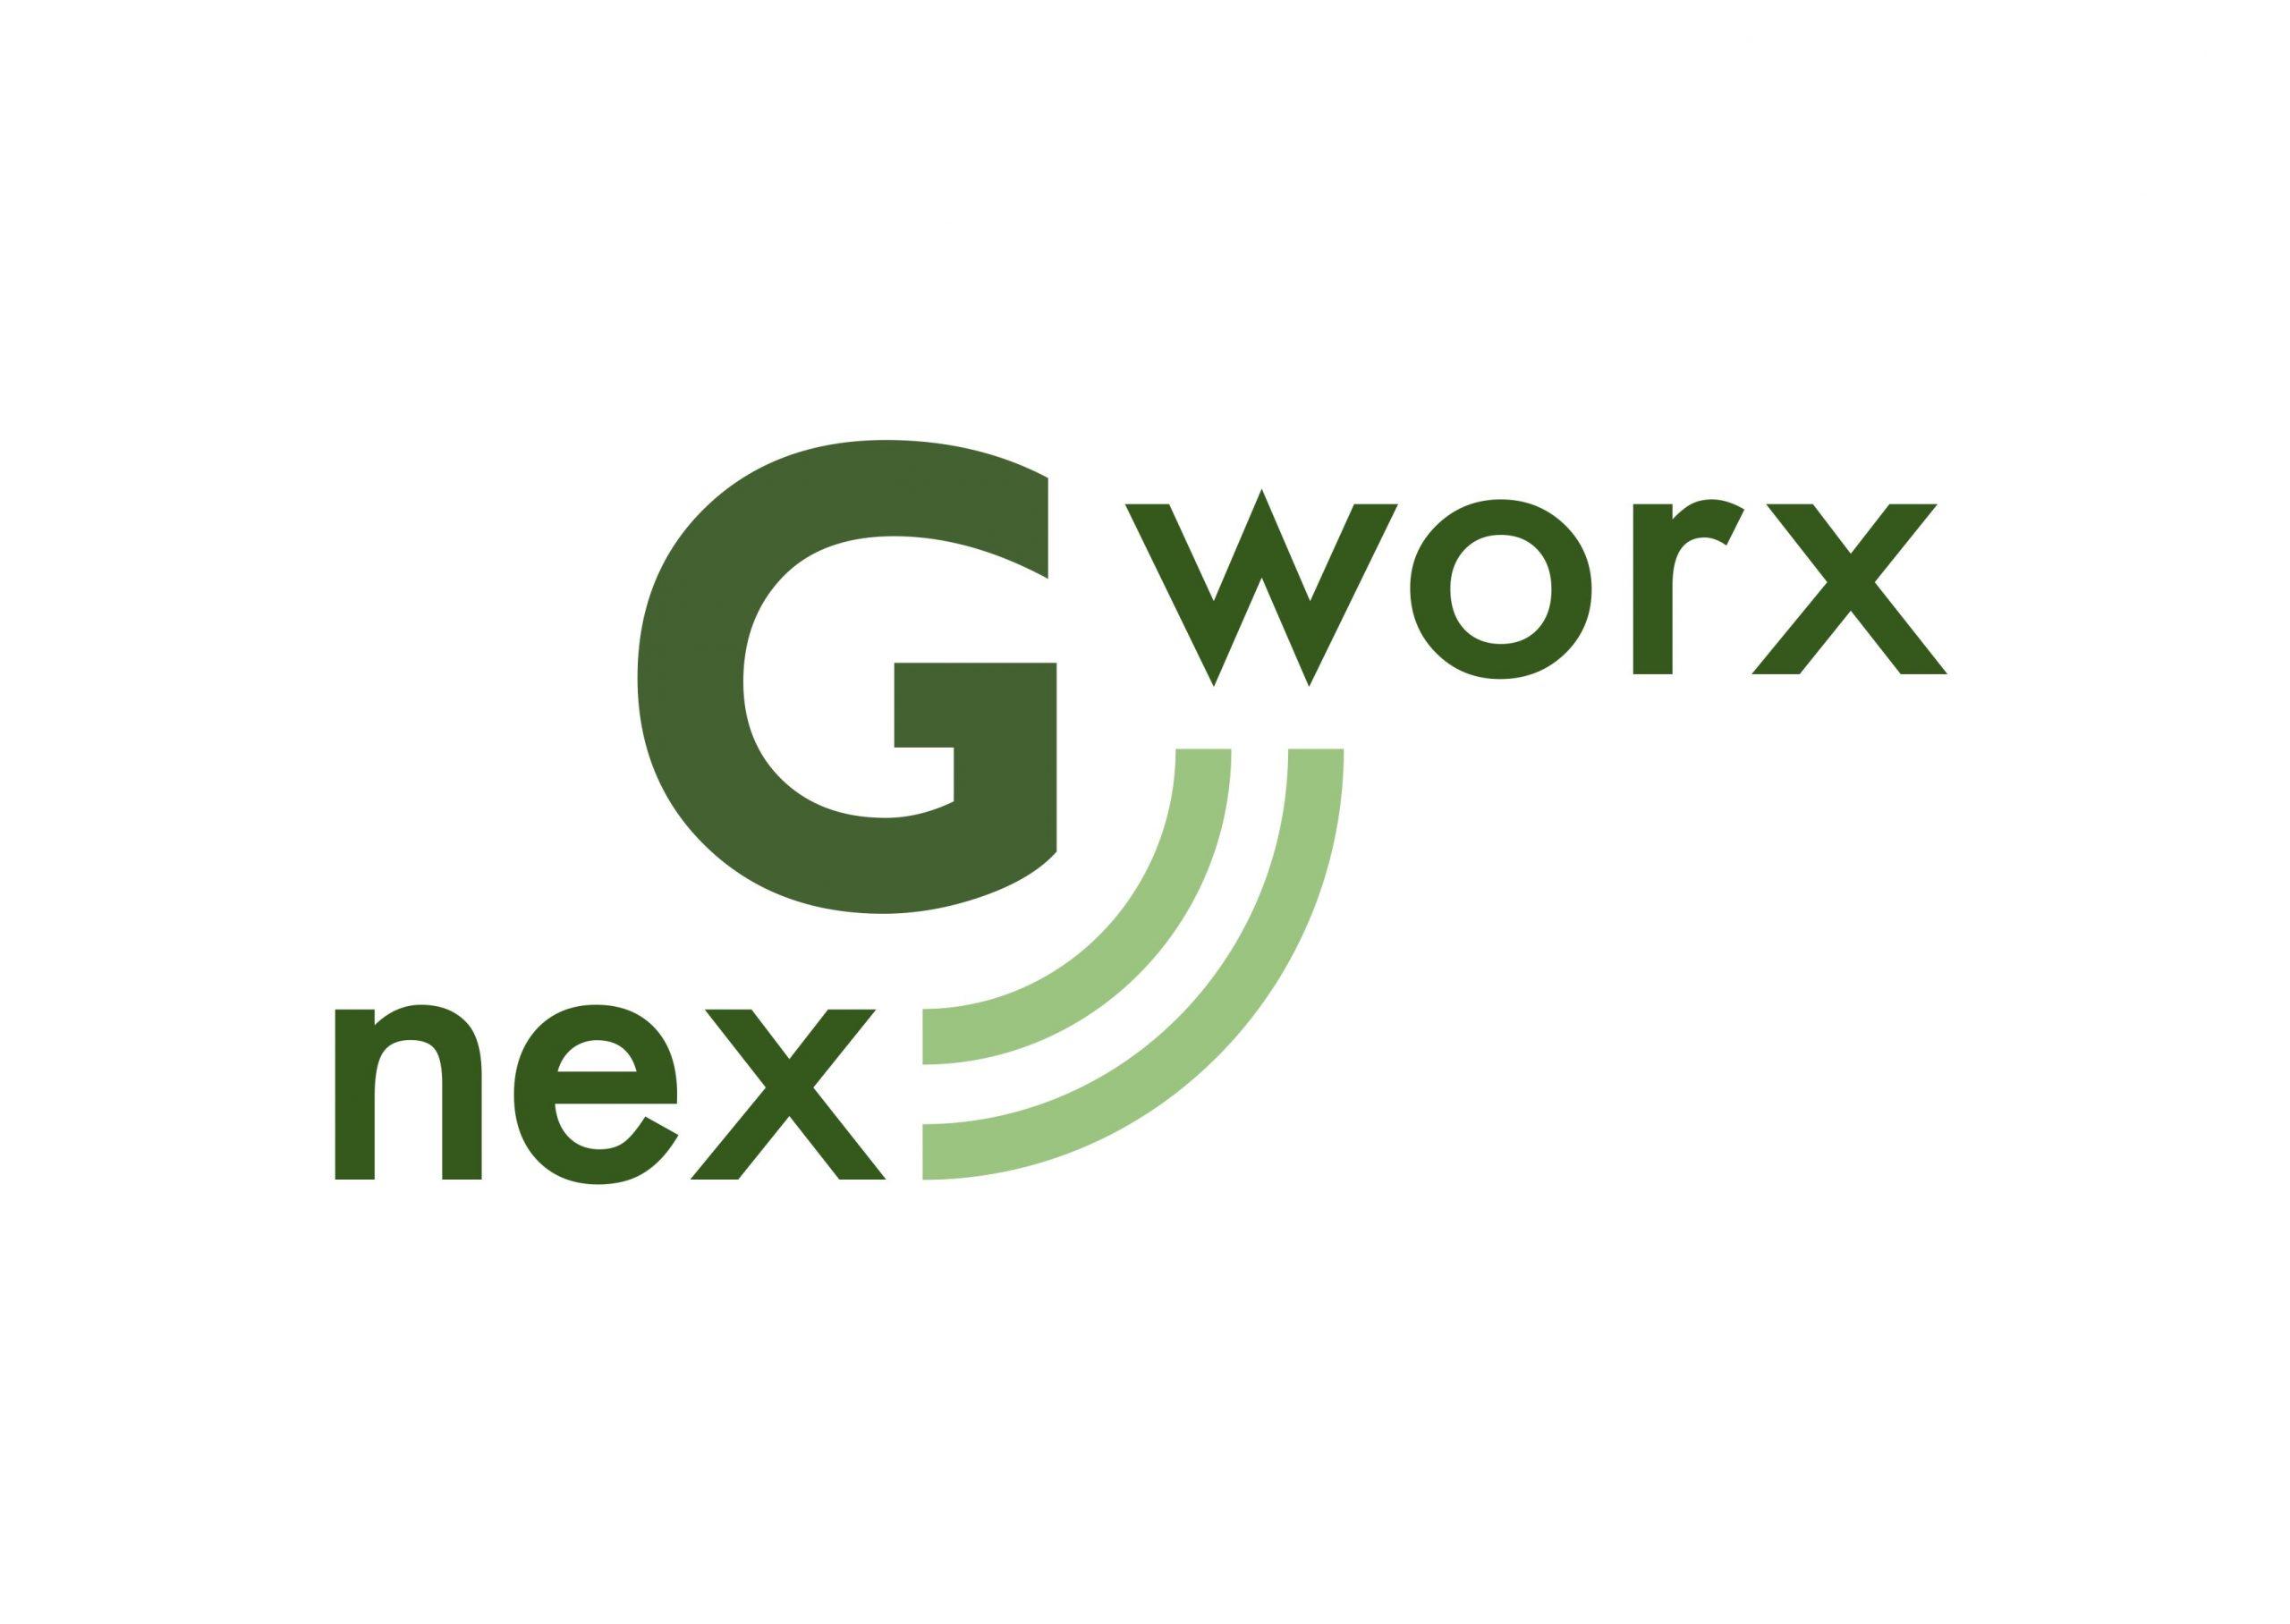 nexGworx logo - Full Size